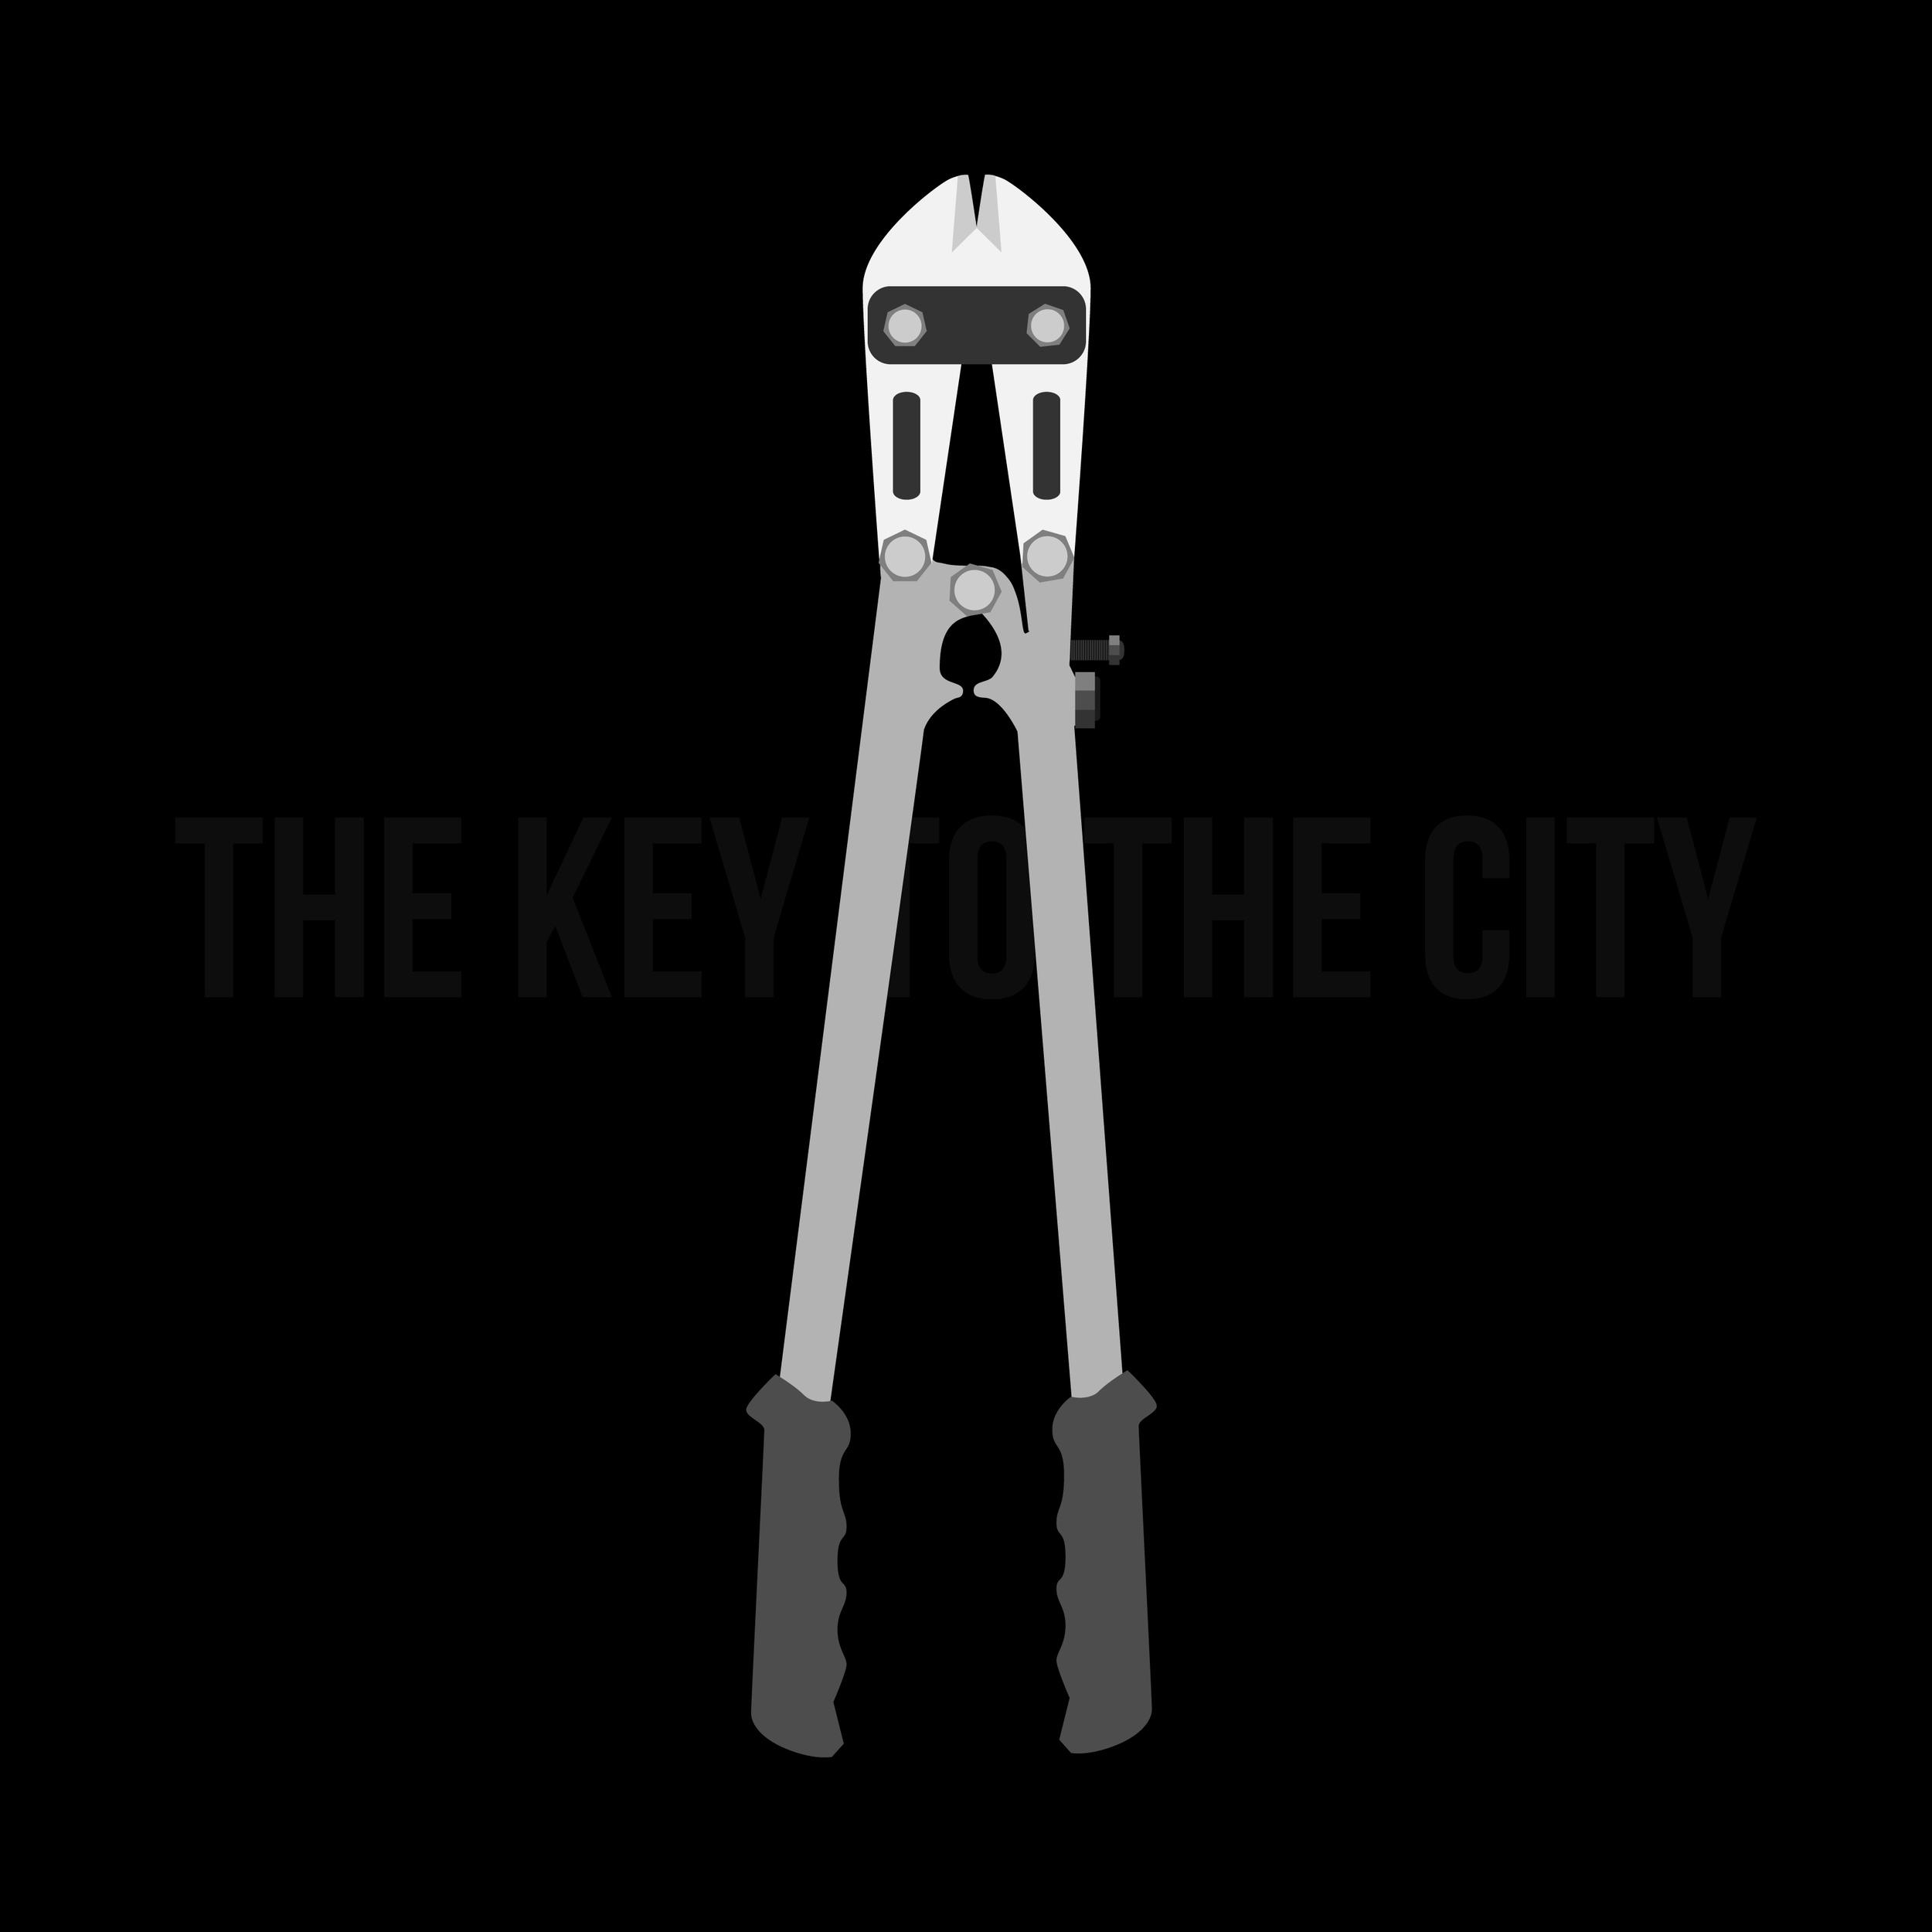 Keys to the city final.jpg